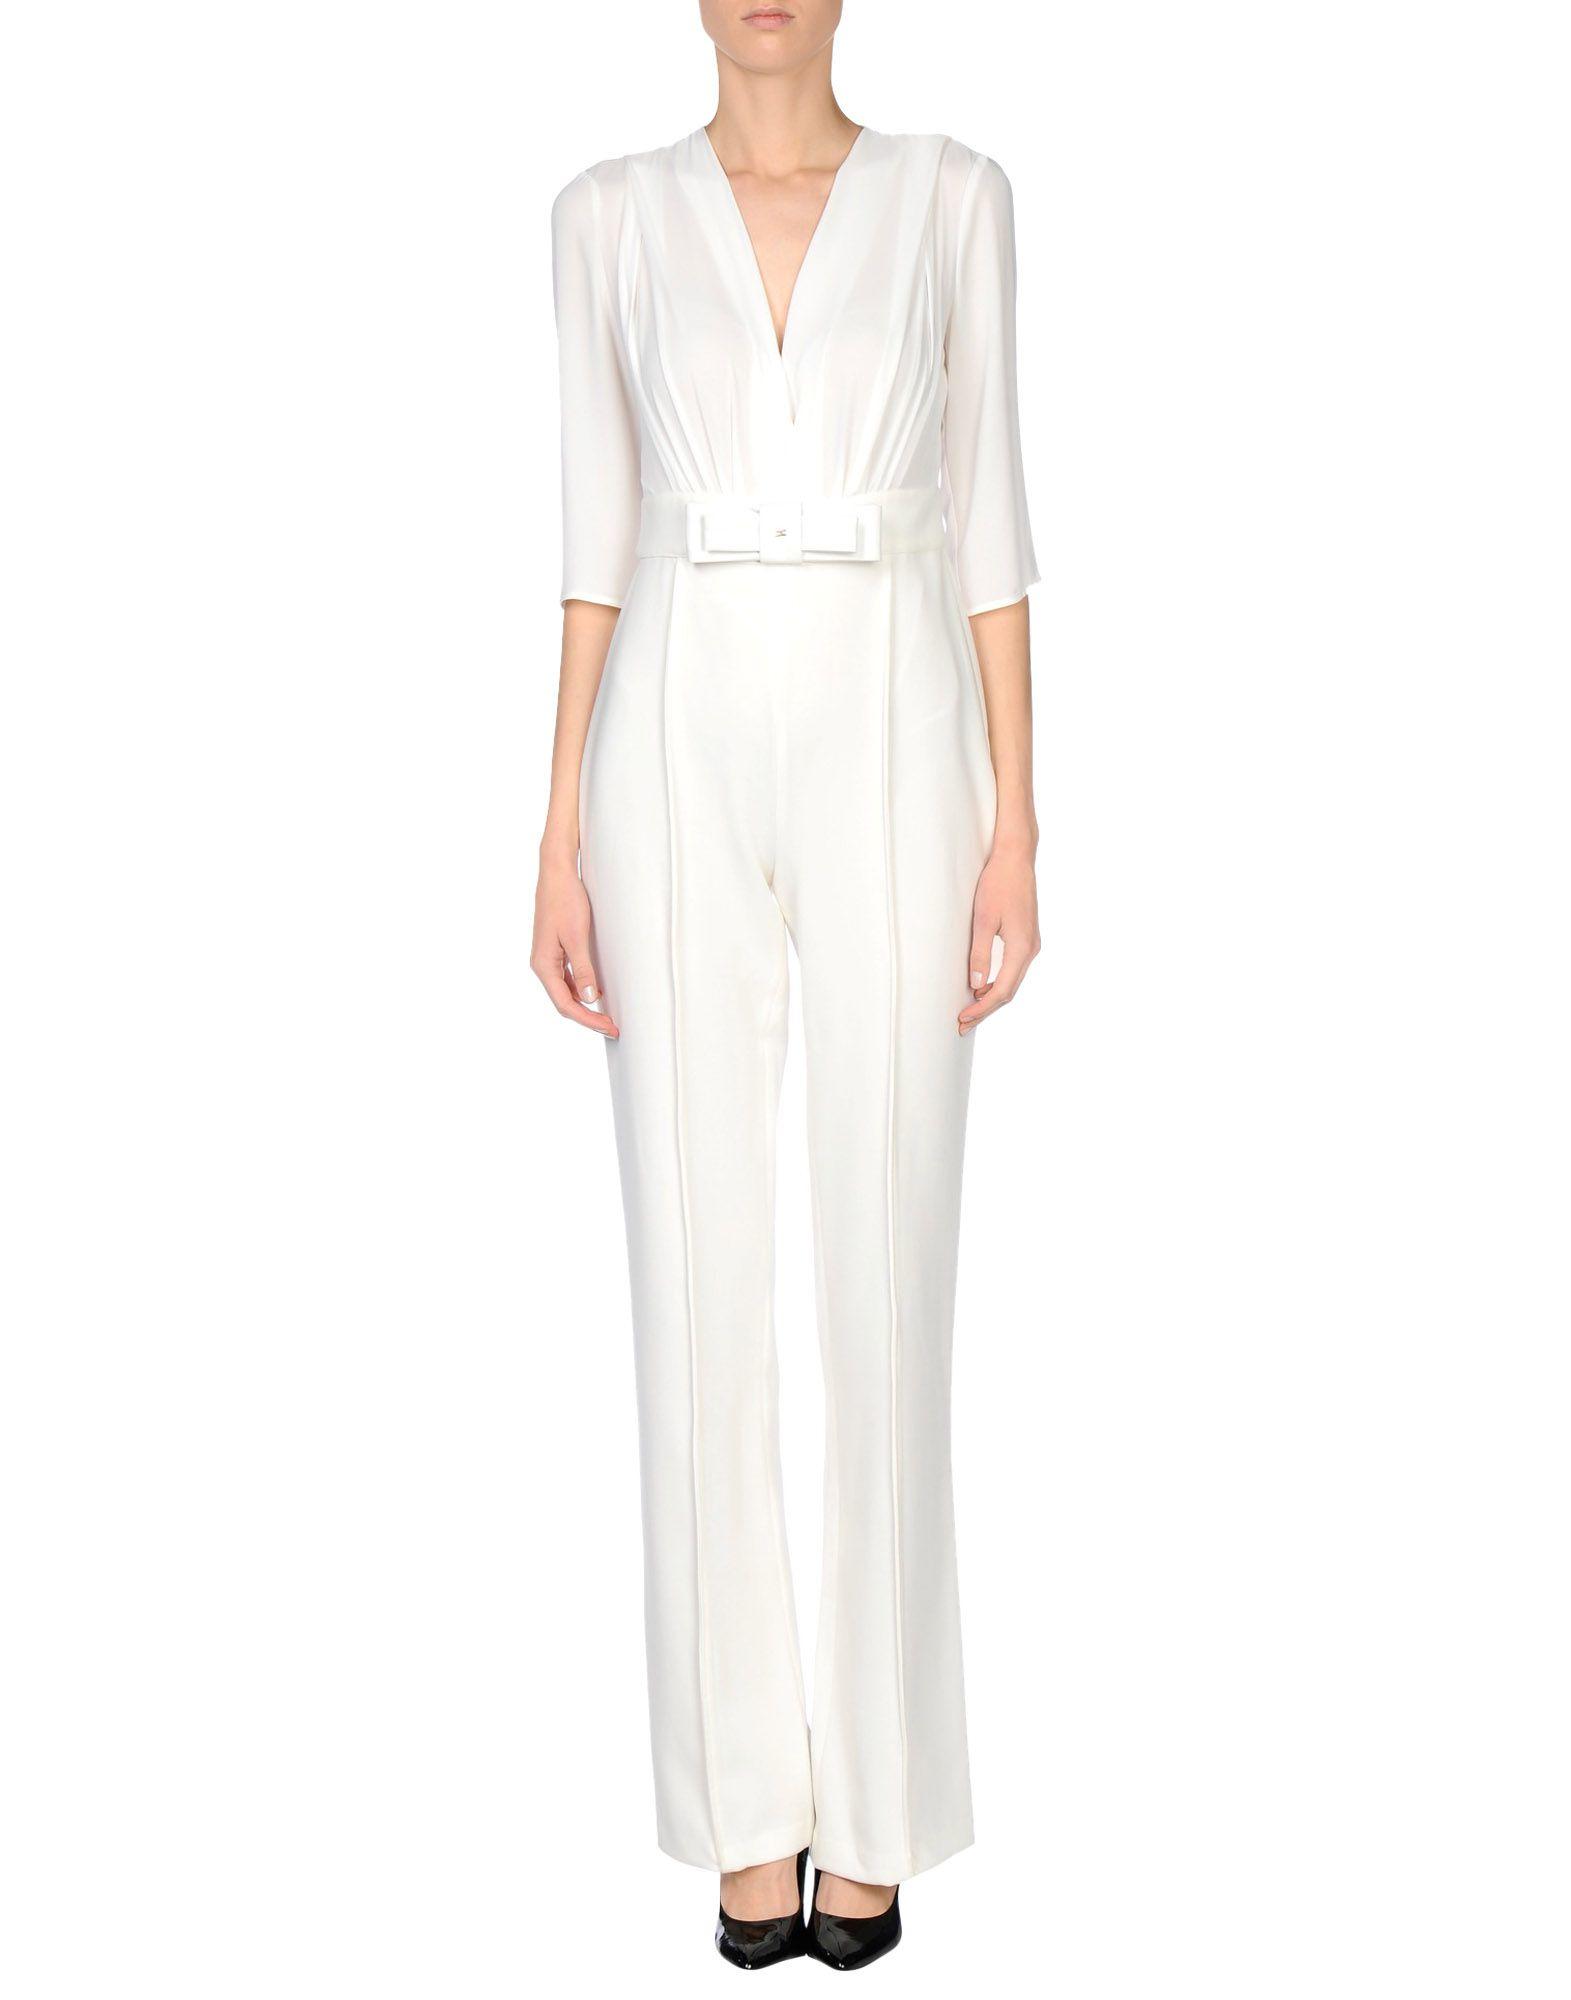 buy popular 5b31f 5e9ce Elisabetta Franchi Jumpsuit in White - Lyst